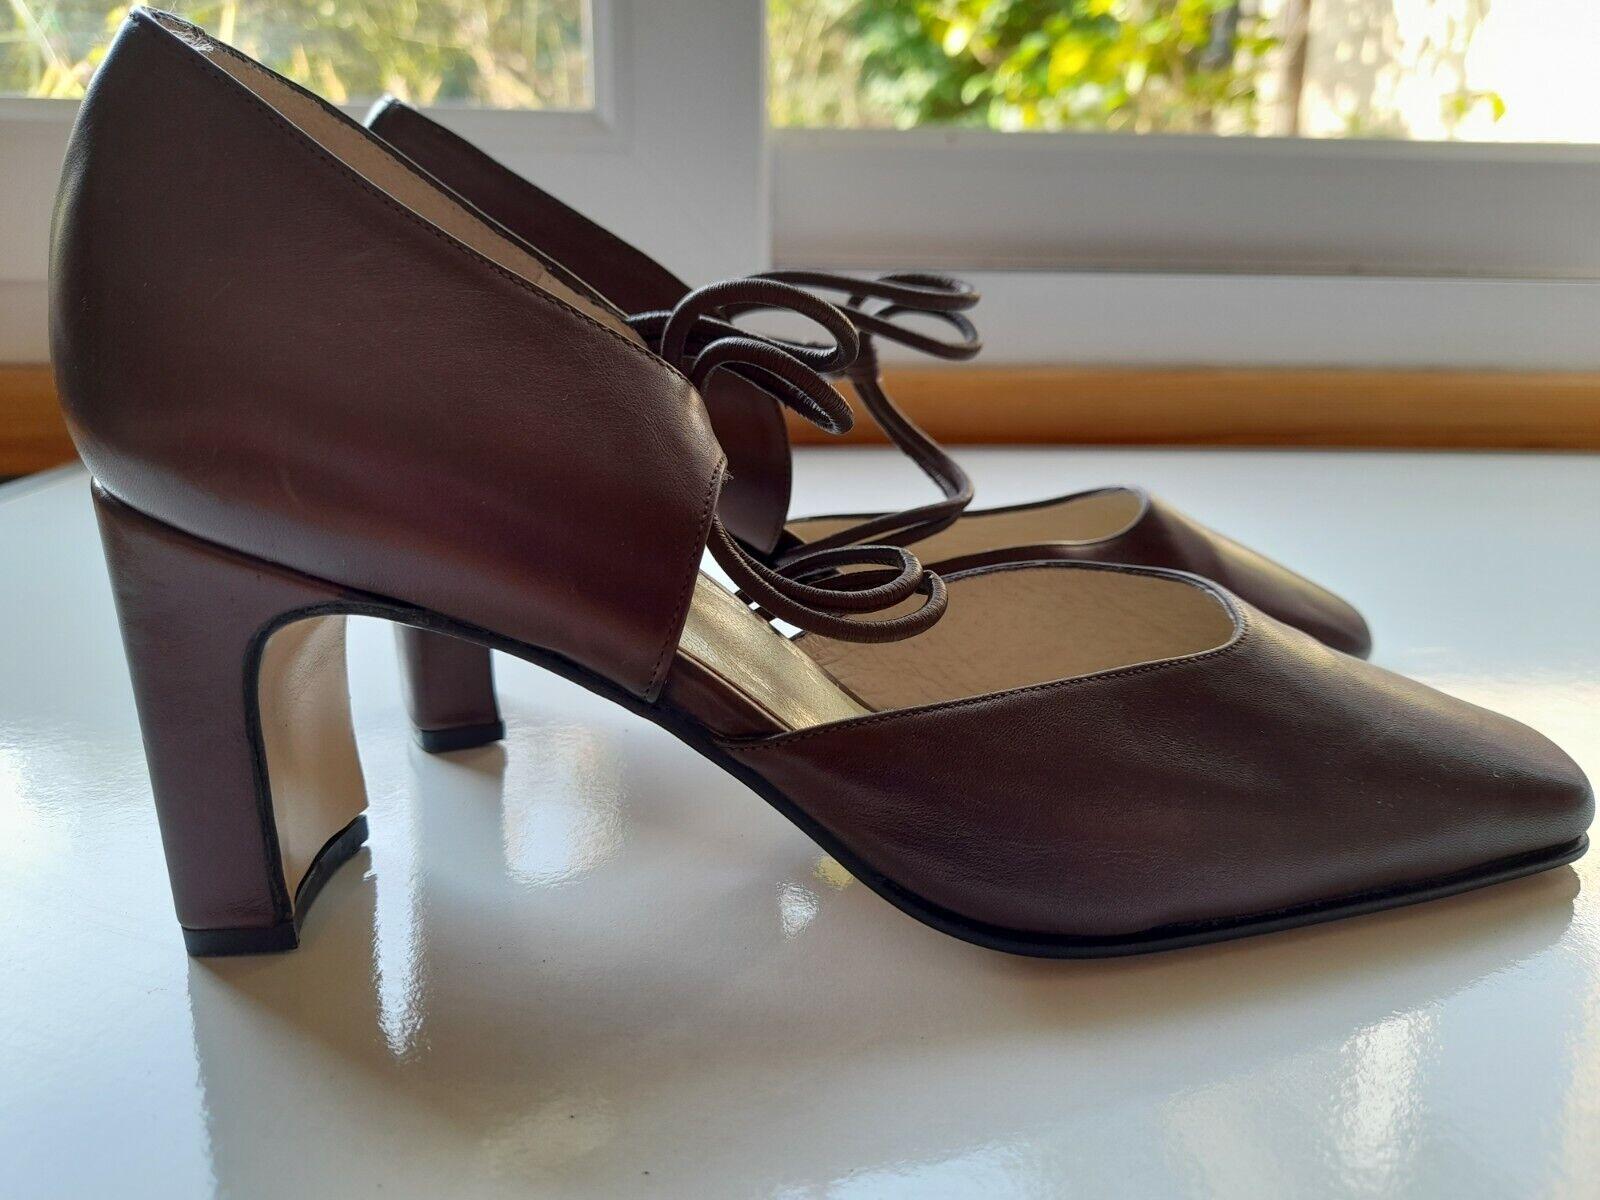 EZZIO Womens Leather Brown Metallic Mid Heel Sandal EU 37/38 UK 5. Made in Spain